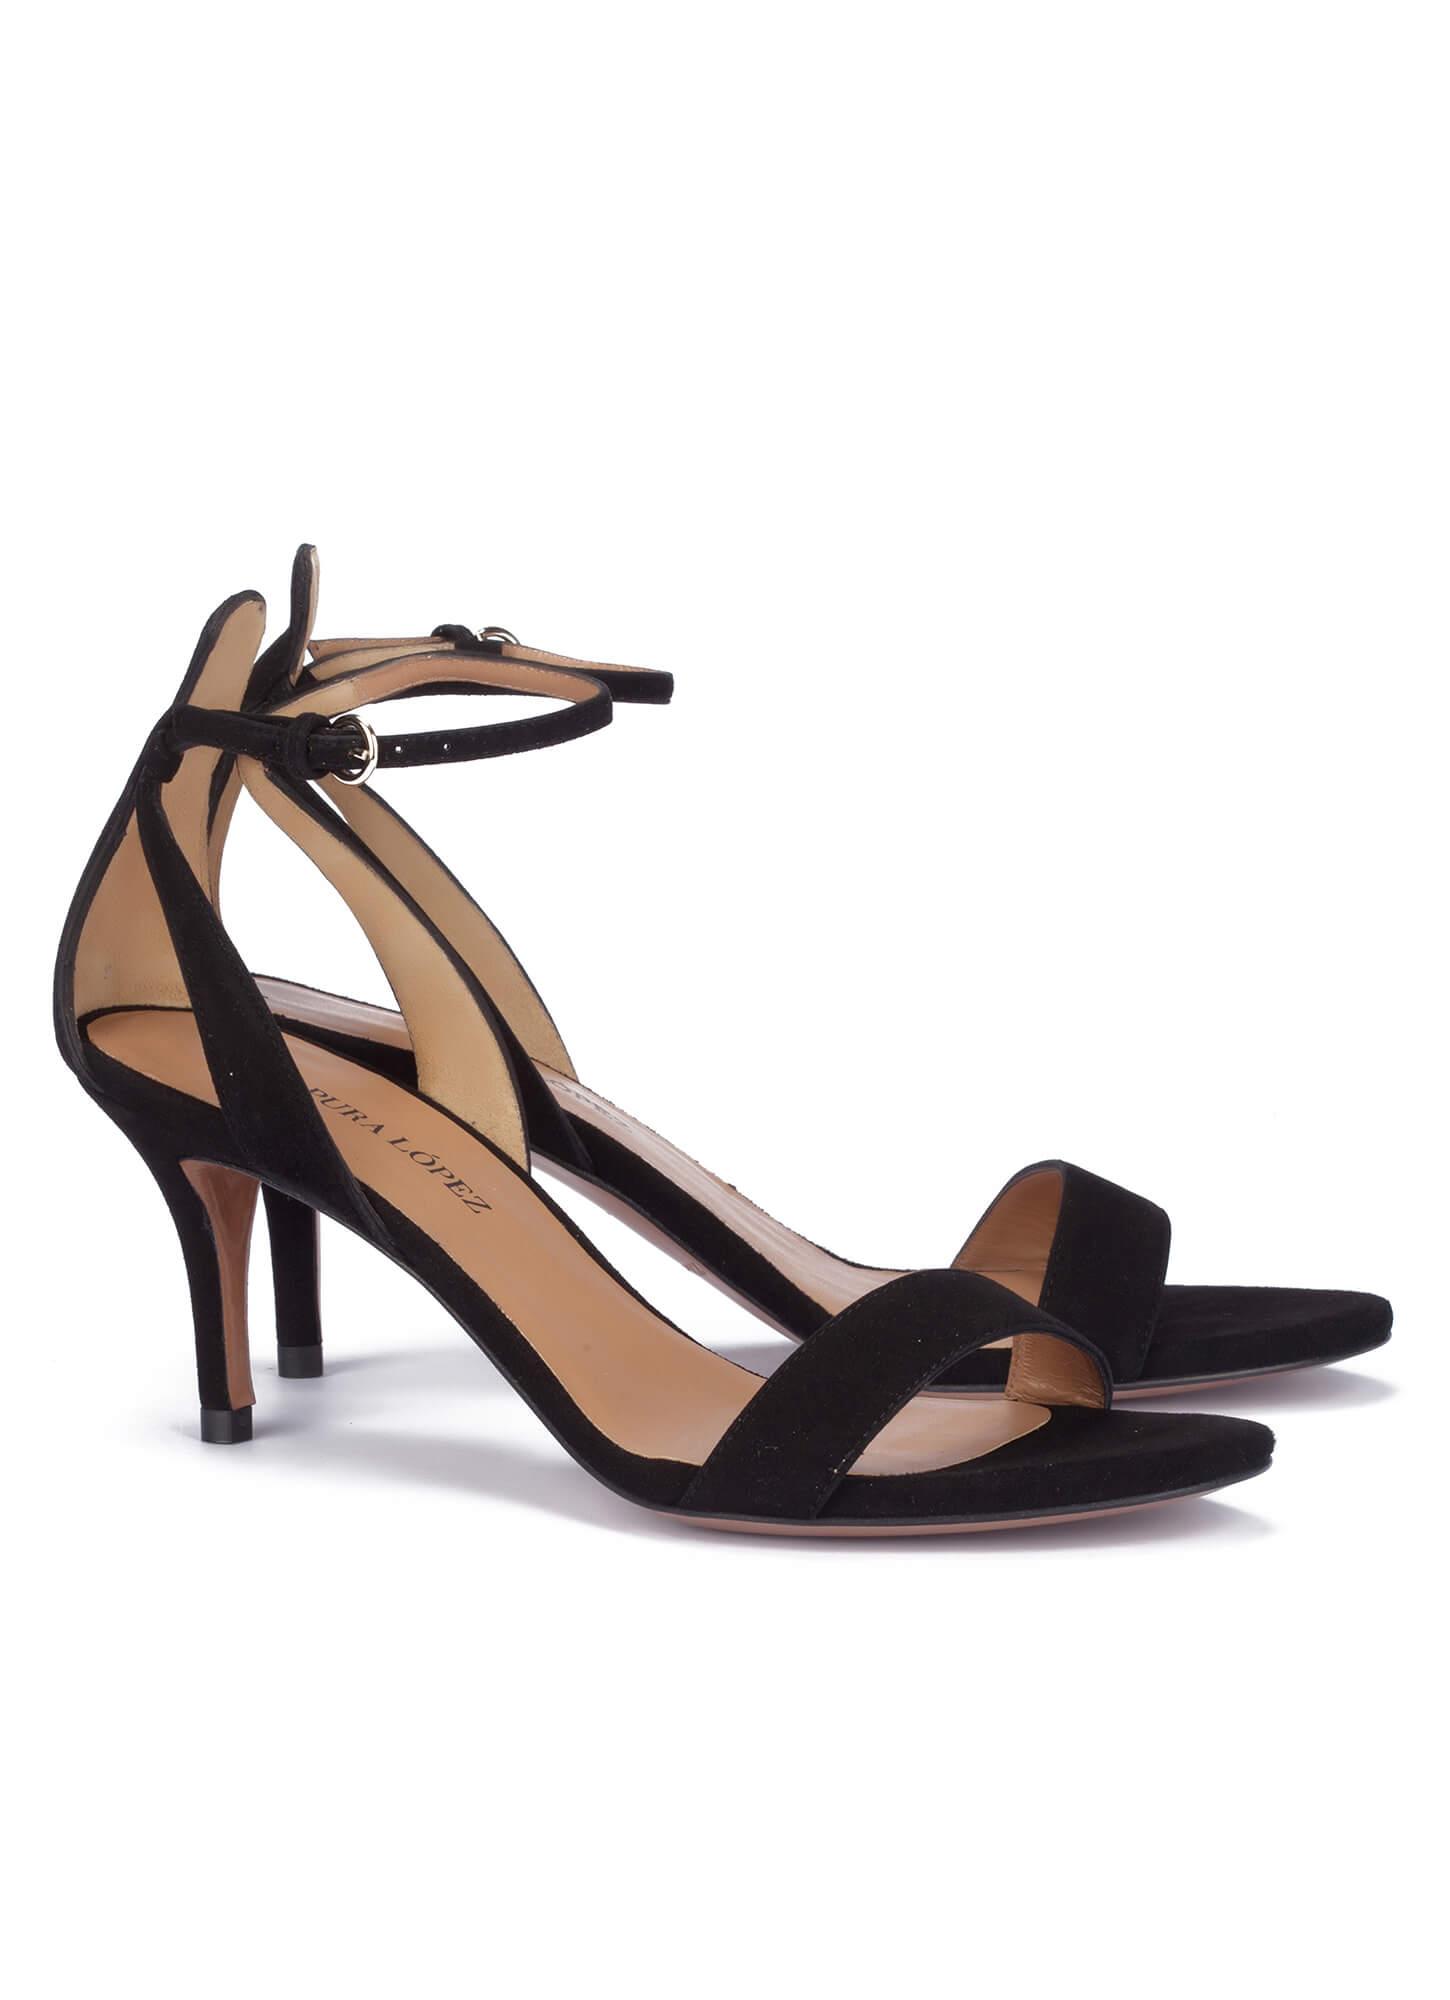 c15772e41f91d4 Sandalias negras de tacón medio - tienda de zapatos Pura López ...